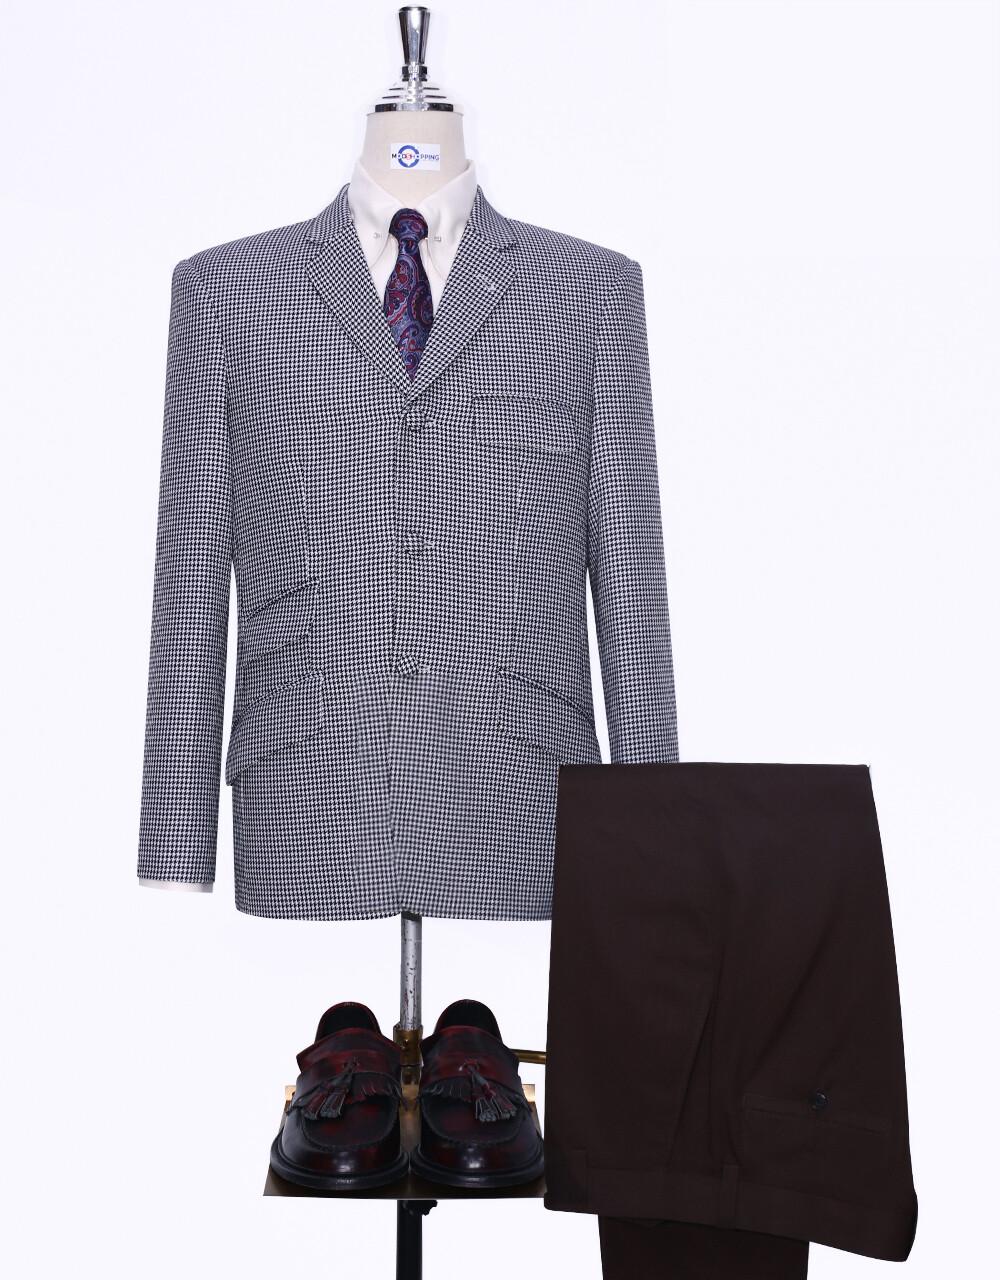 Classic Black & White Houndstooth Mod Blazer Jacket